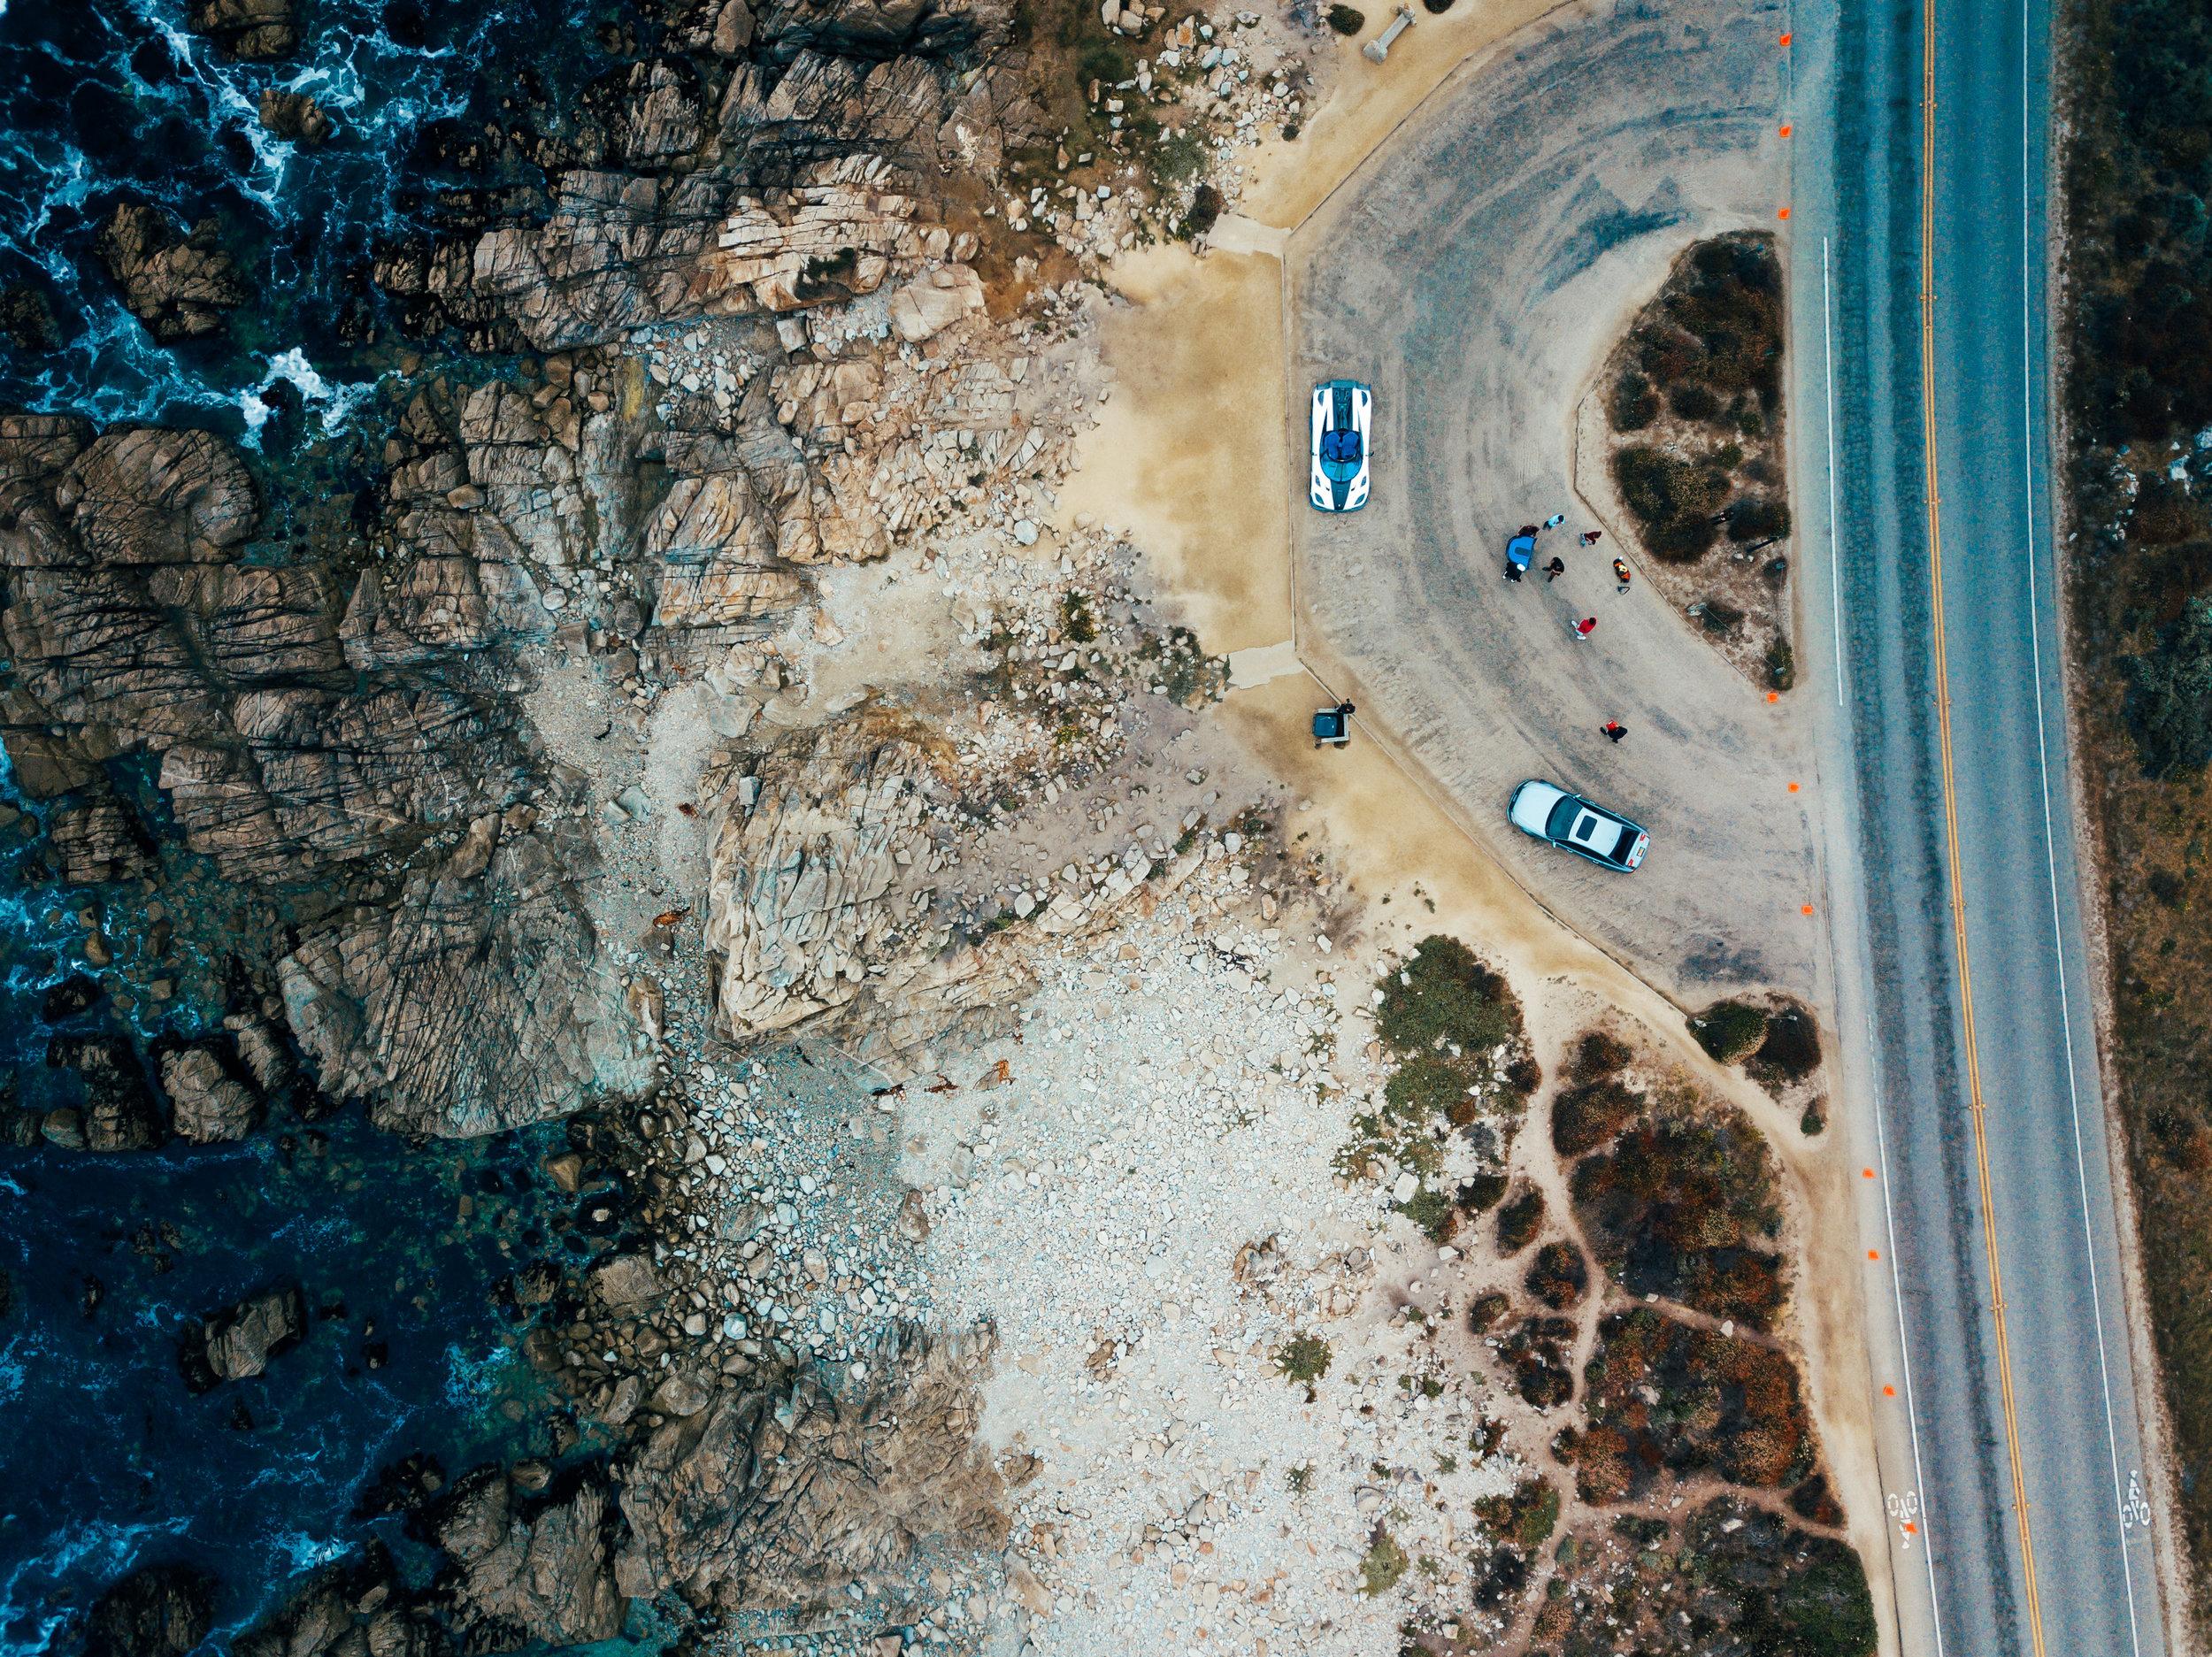 Stay_Driven_Monterey_Car_Week_Whitesse_Koenigsegg-6.jpg